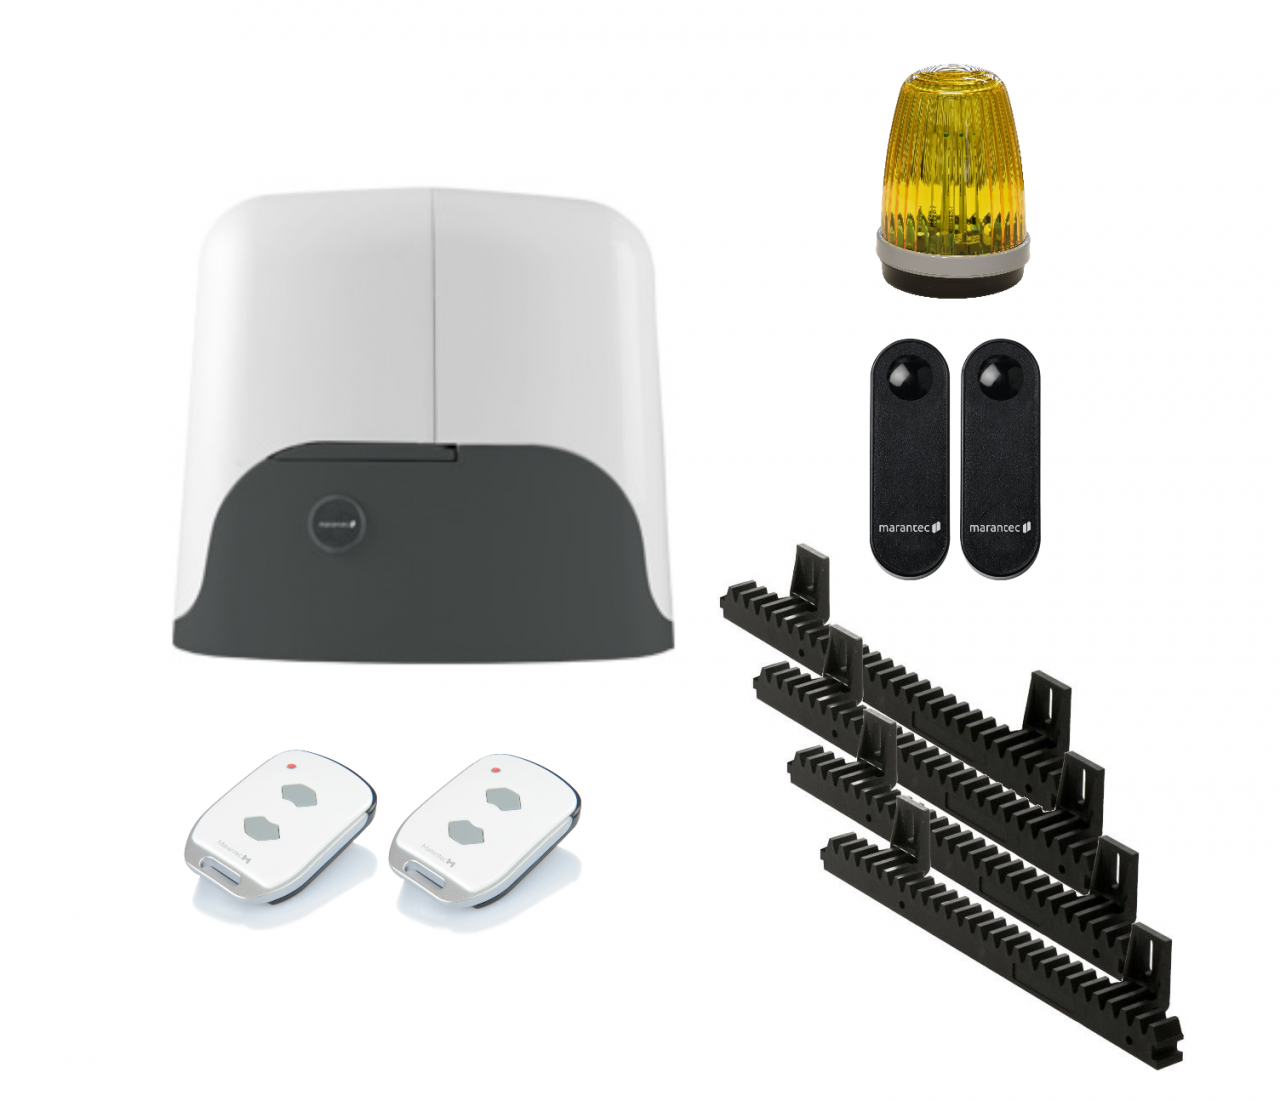 Marantec Schiebetorantrieb Comfort Kit SU500F Fastline Komplettset